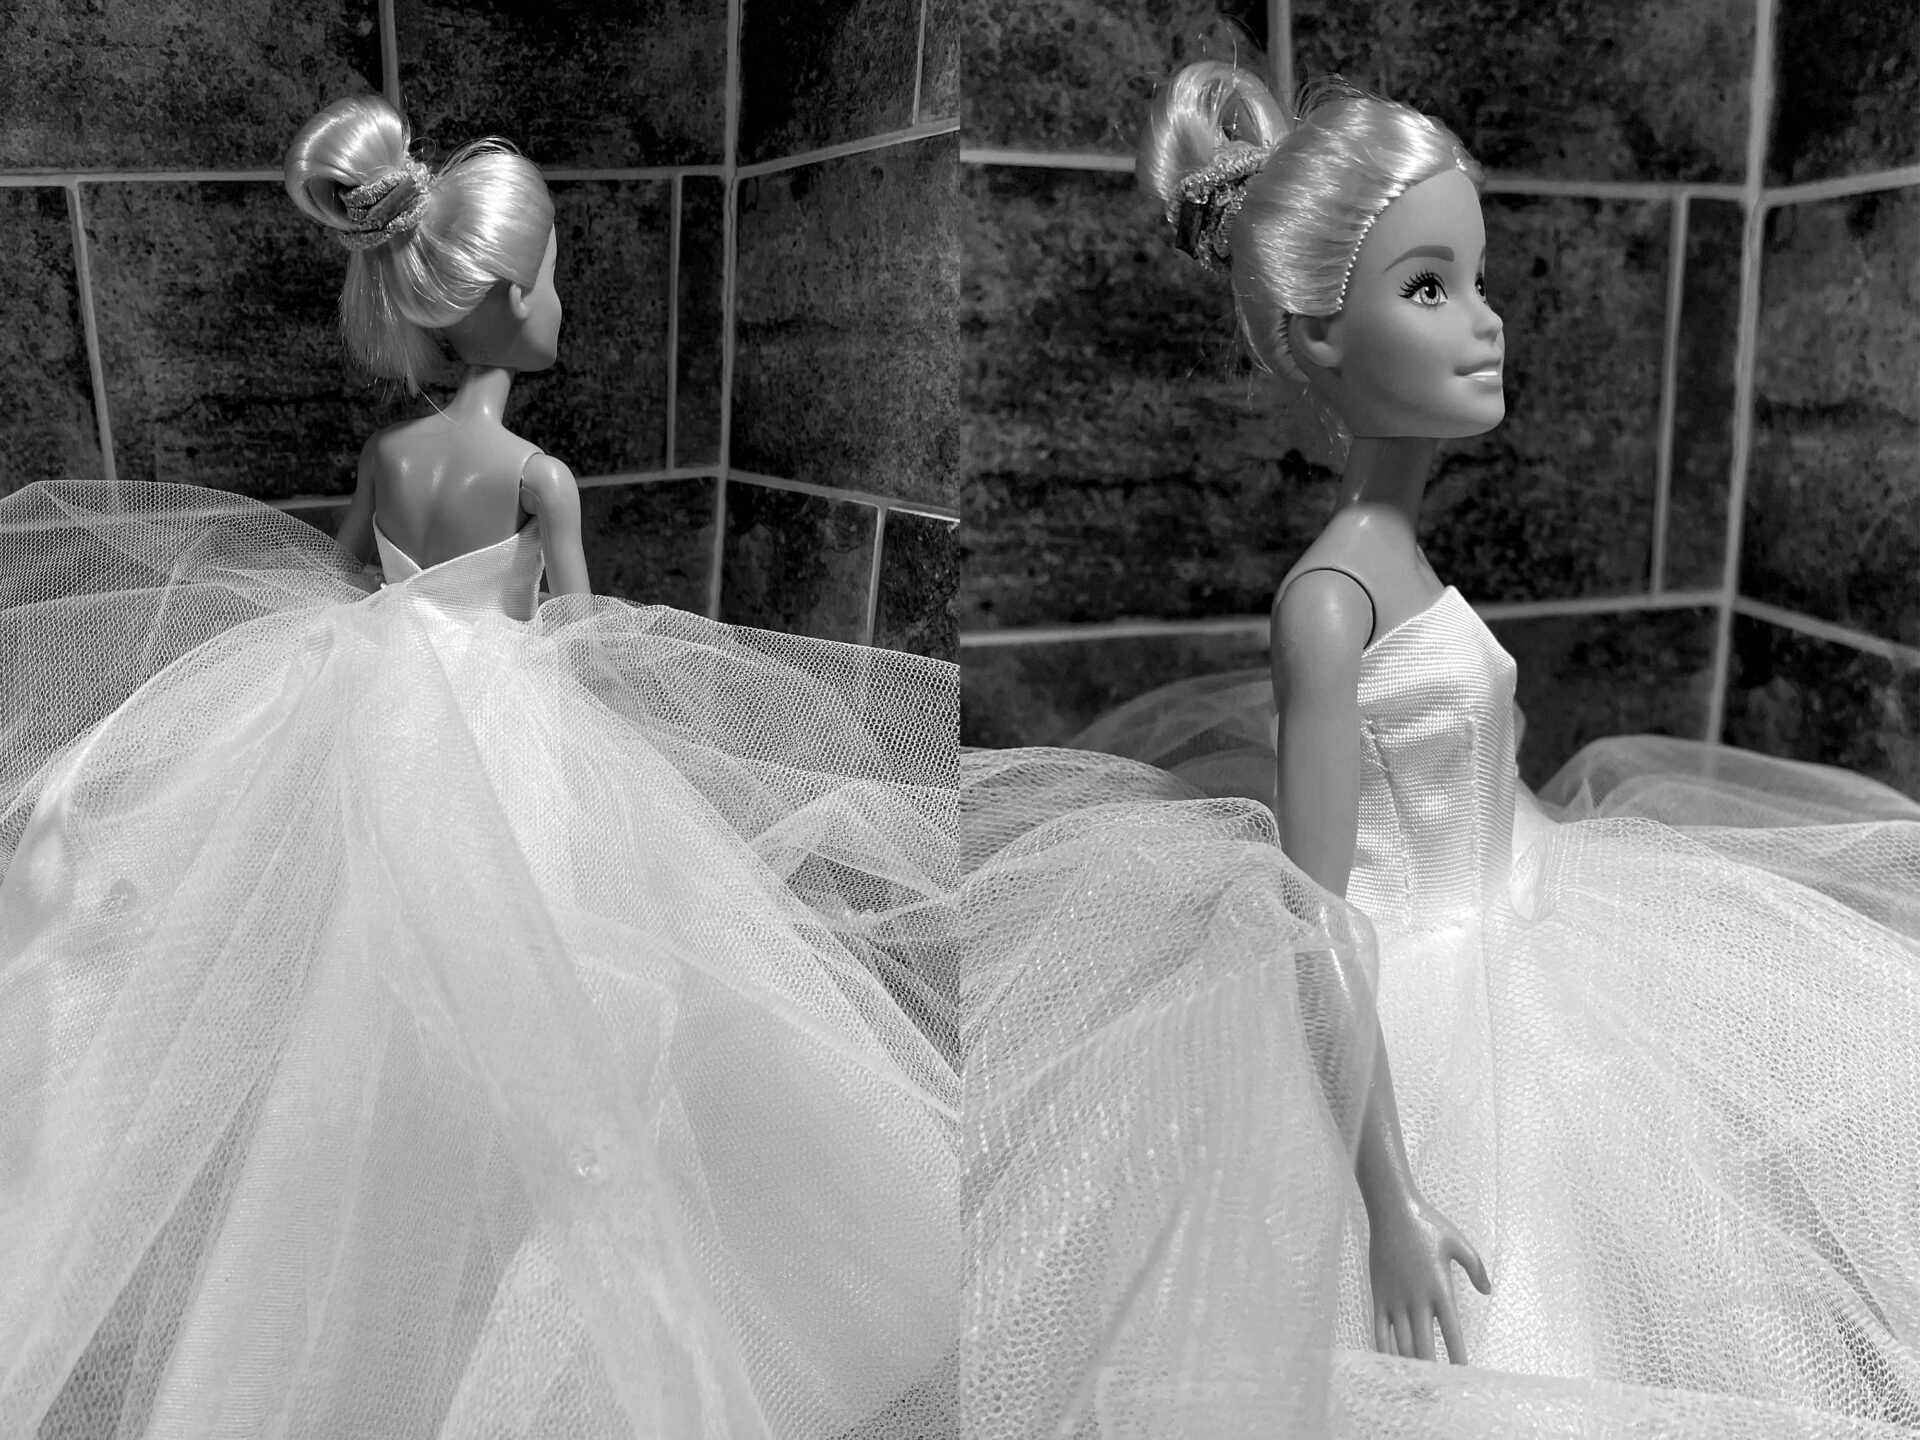 Barbie Miniature Bridal Gown